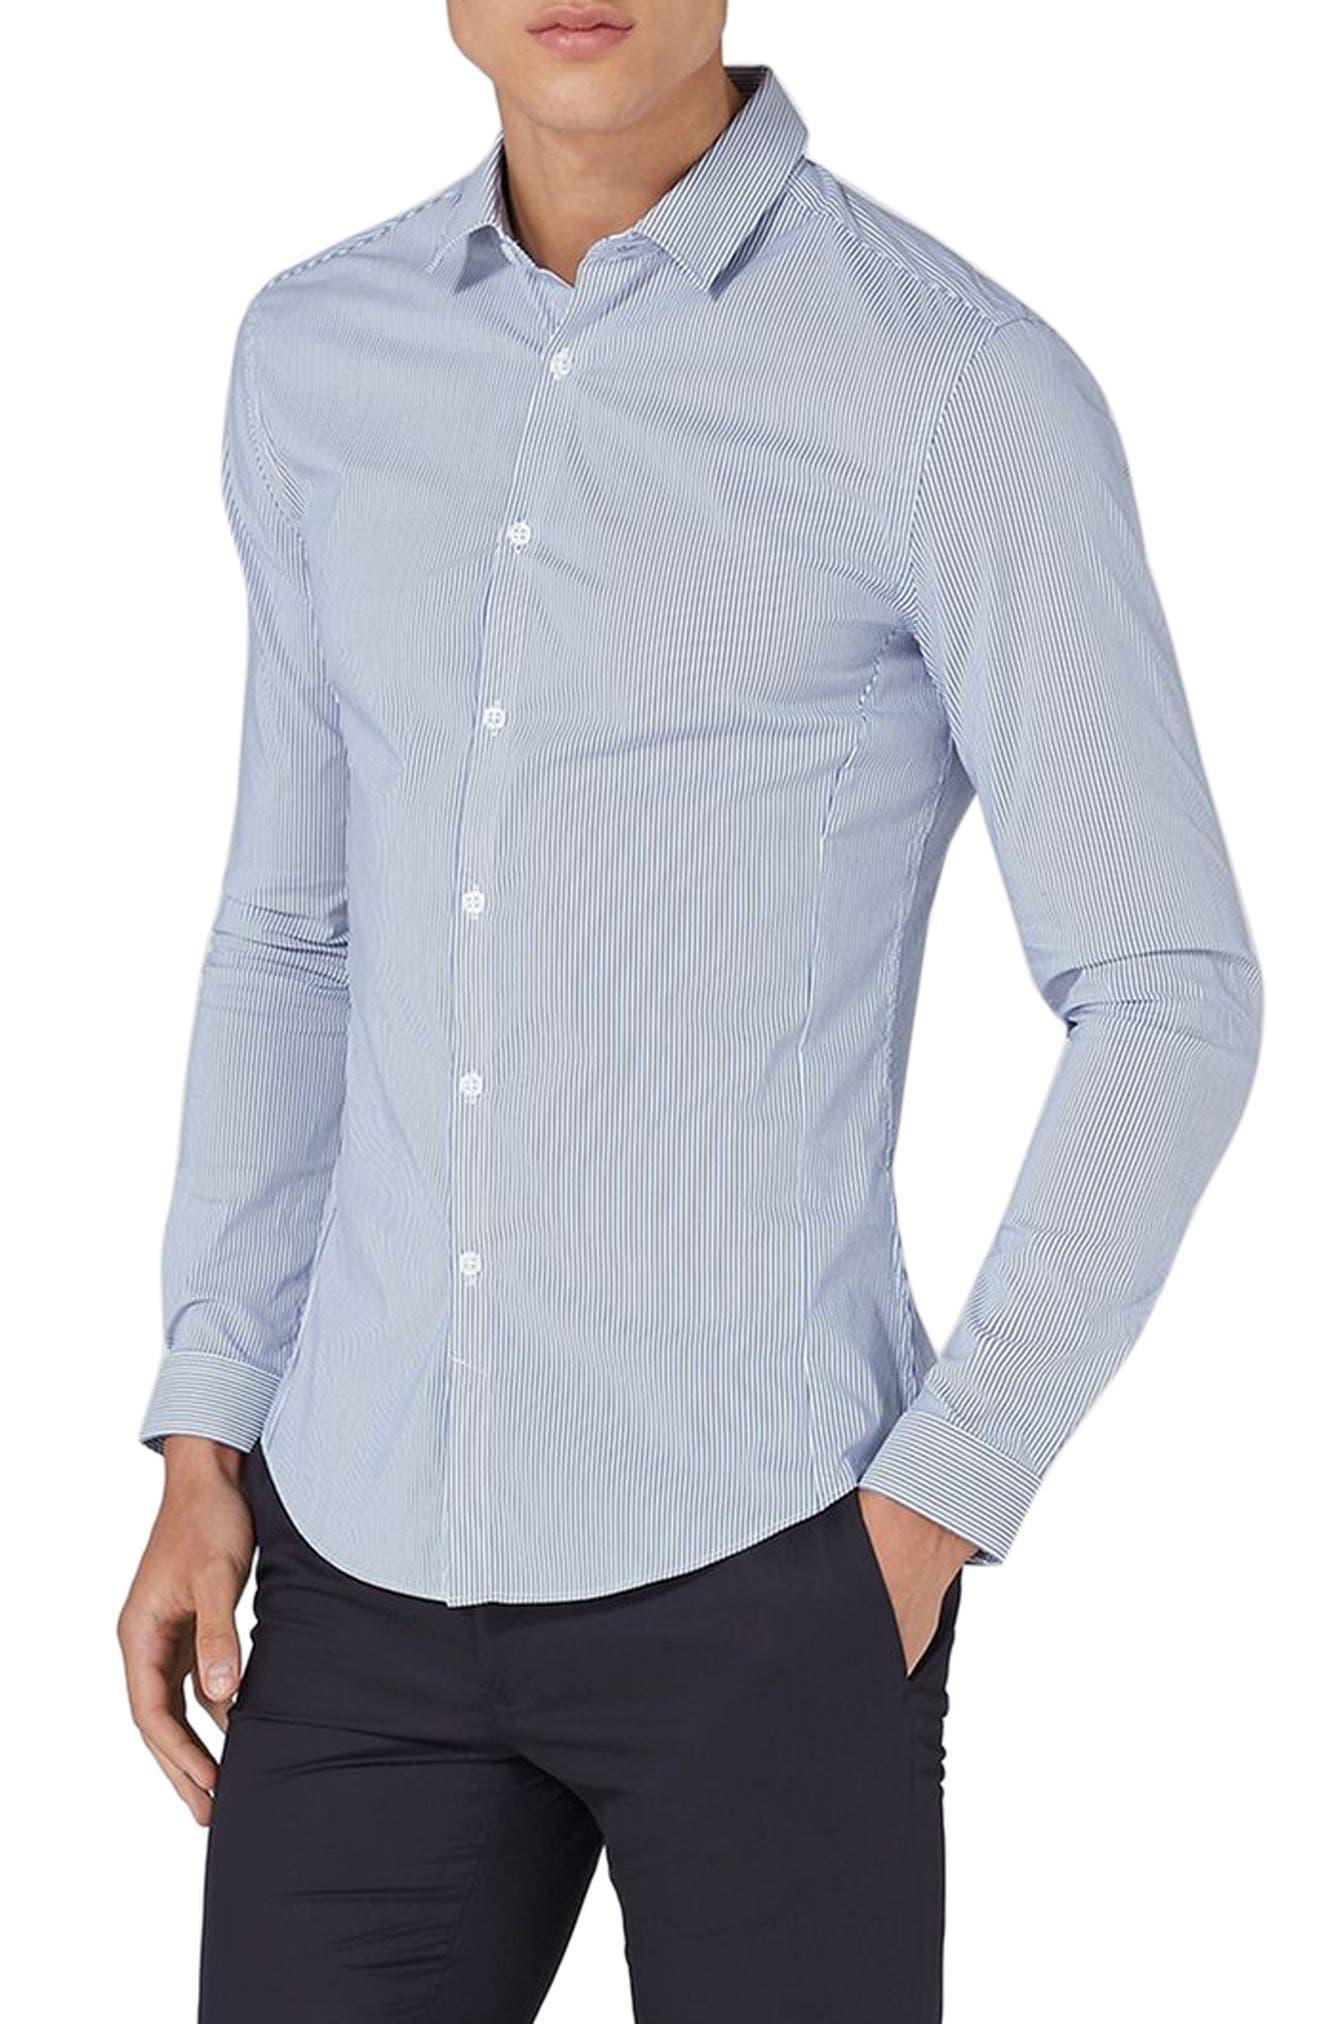 Muscle Fit Smart Shirt,                         Main,                         color, 400